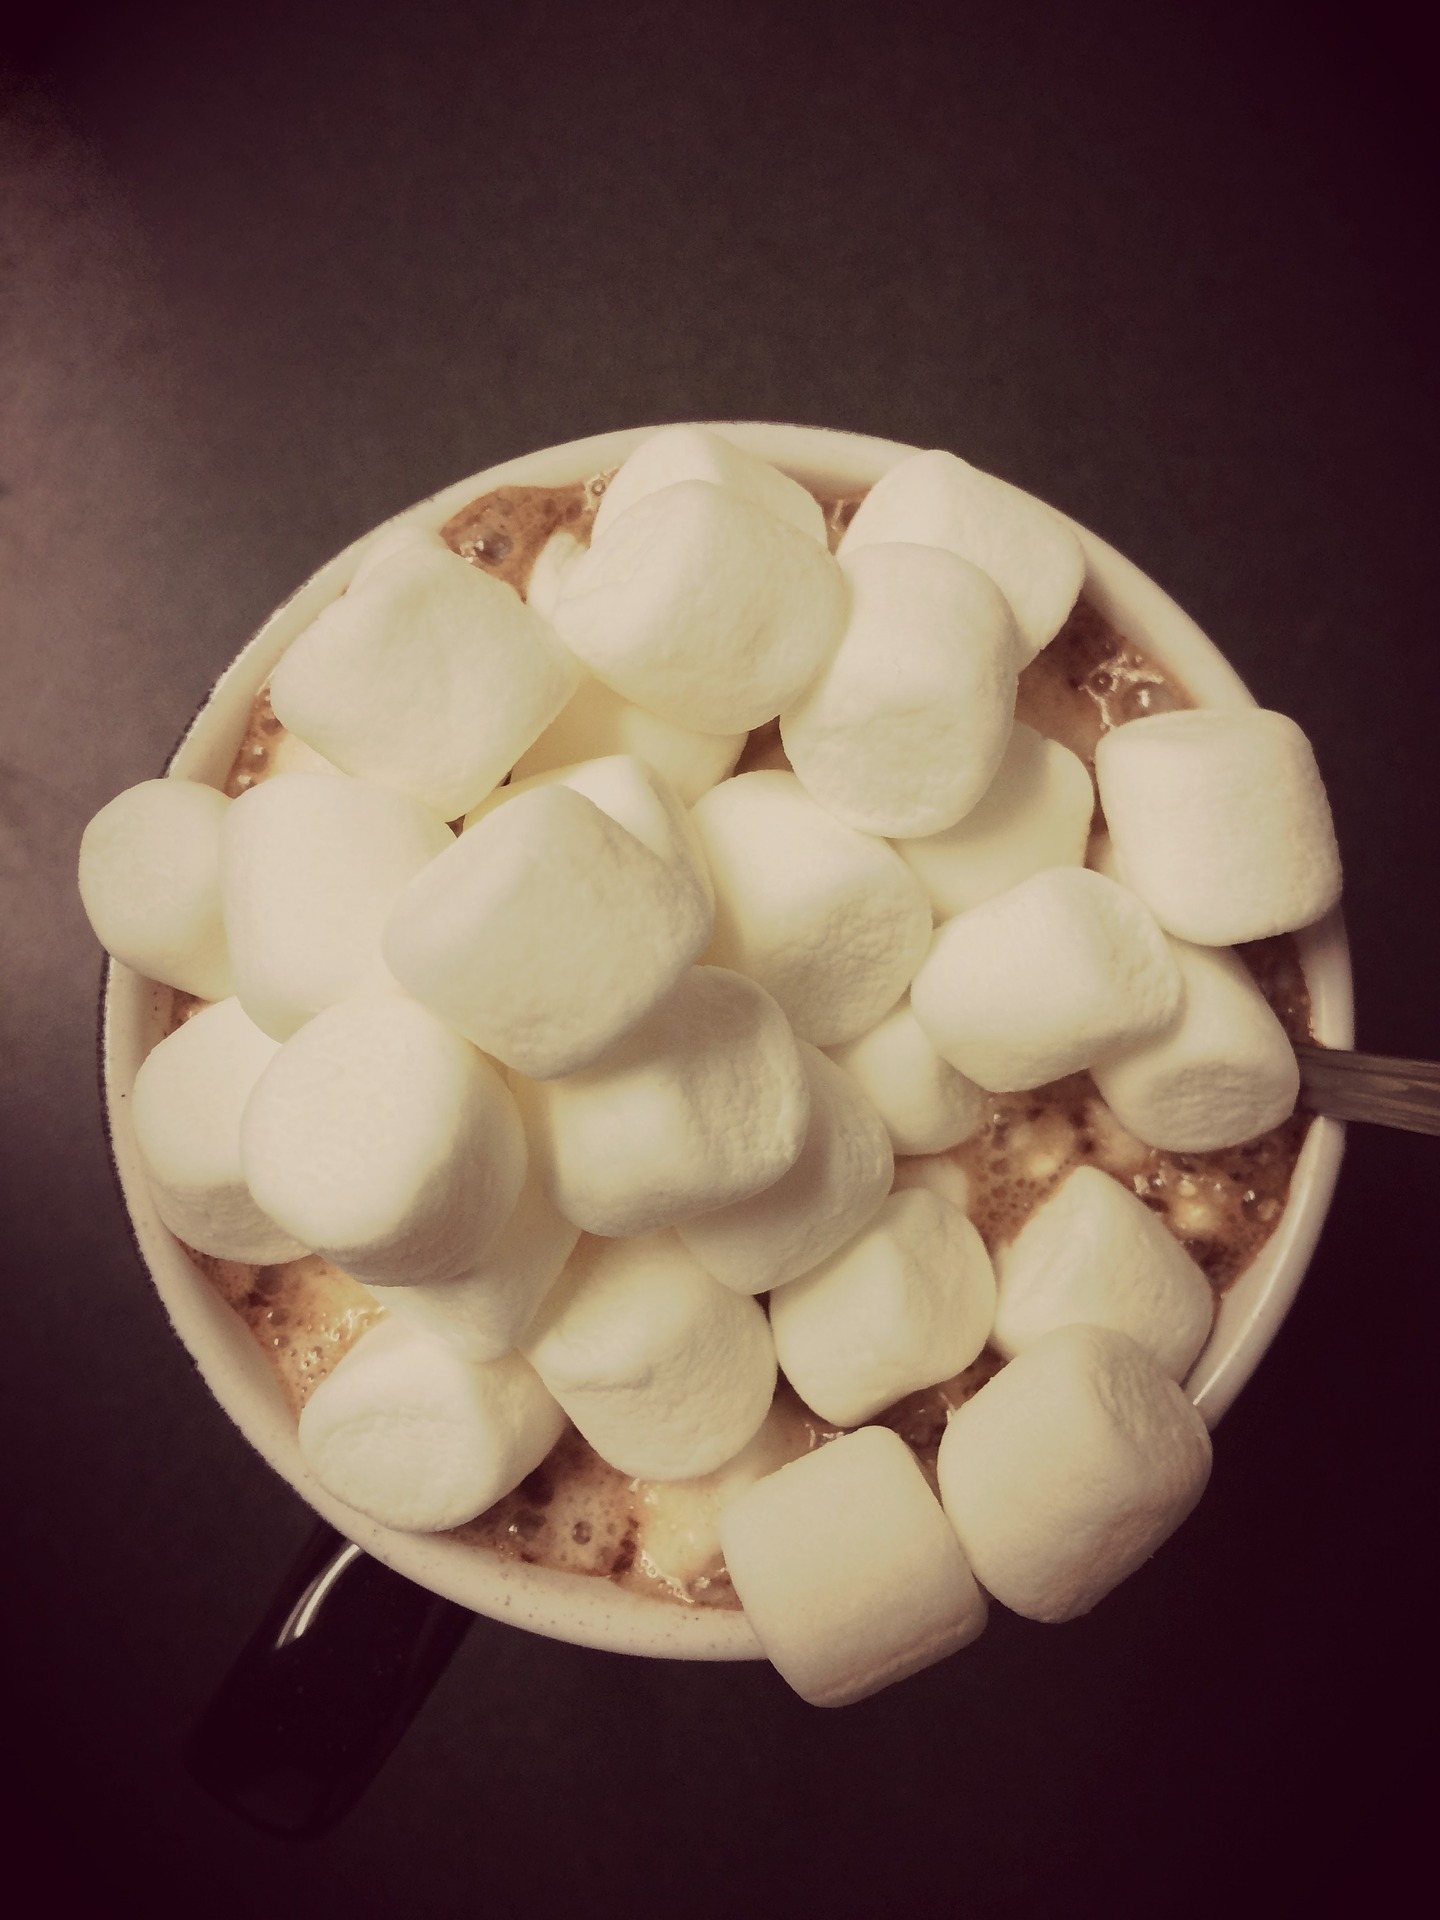 goraca czekolada